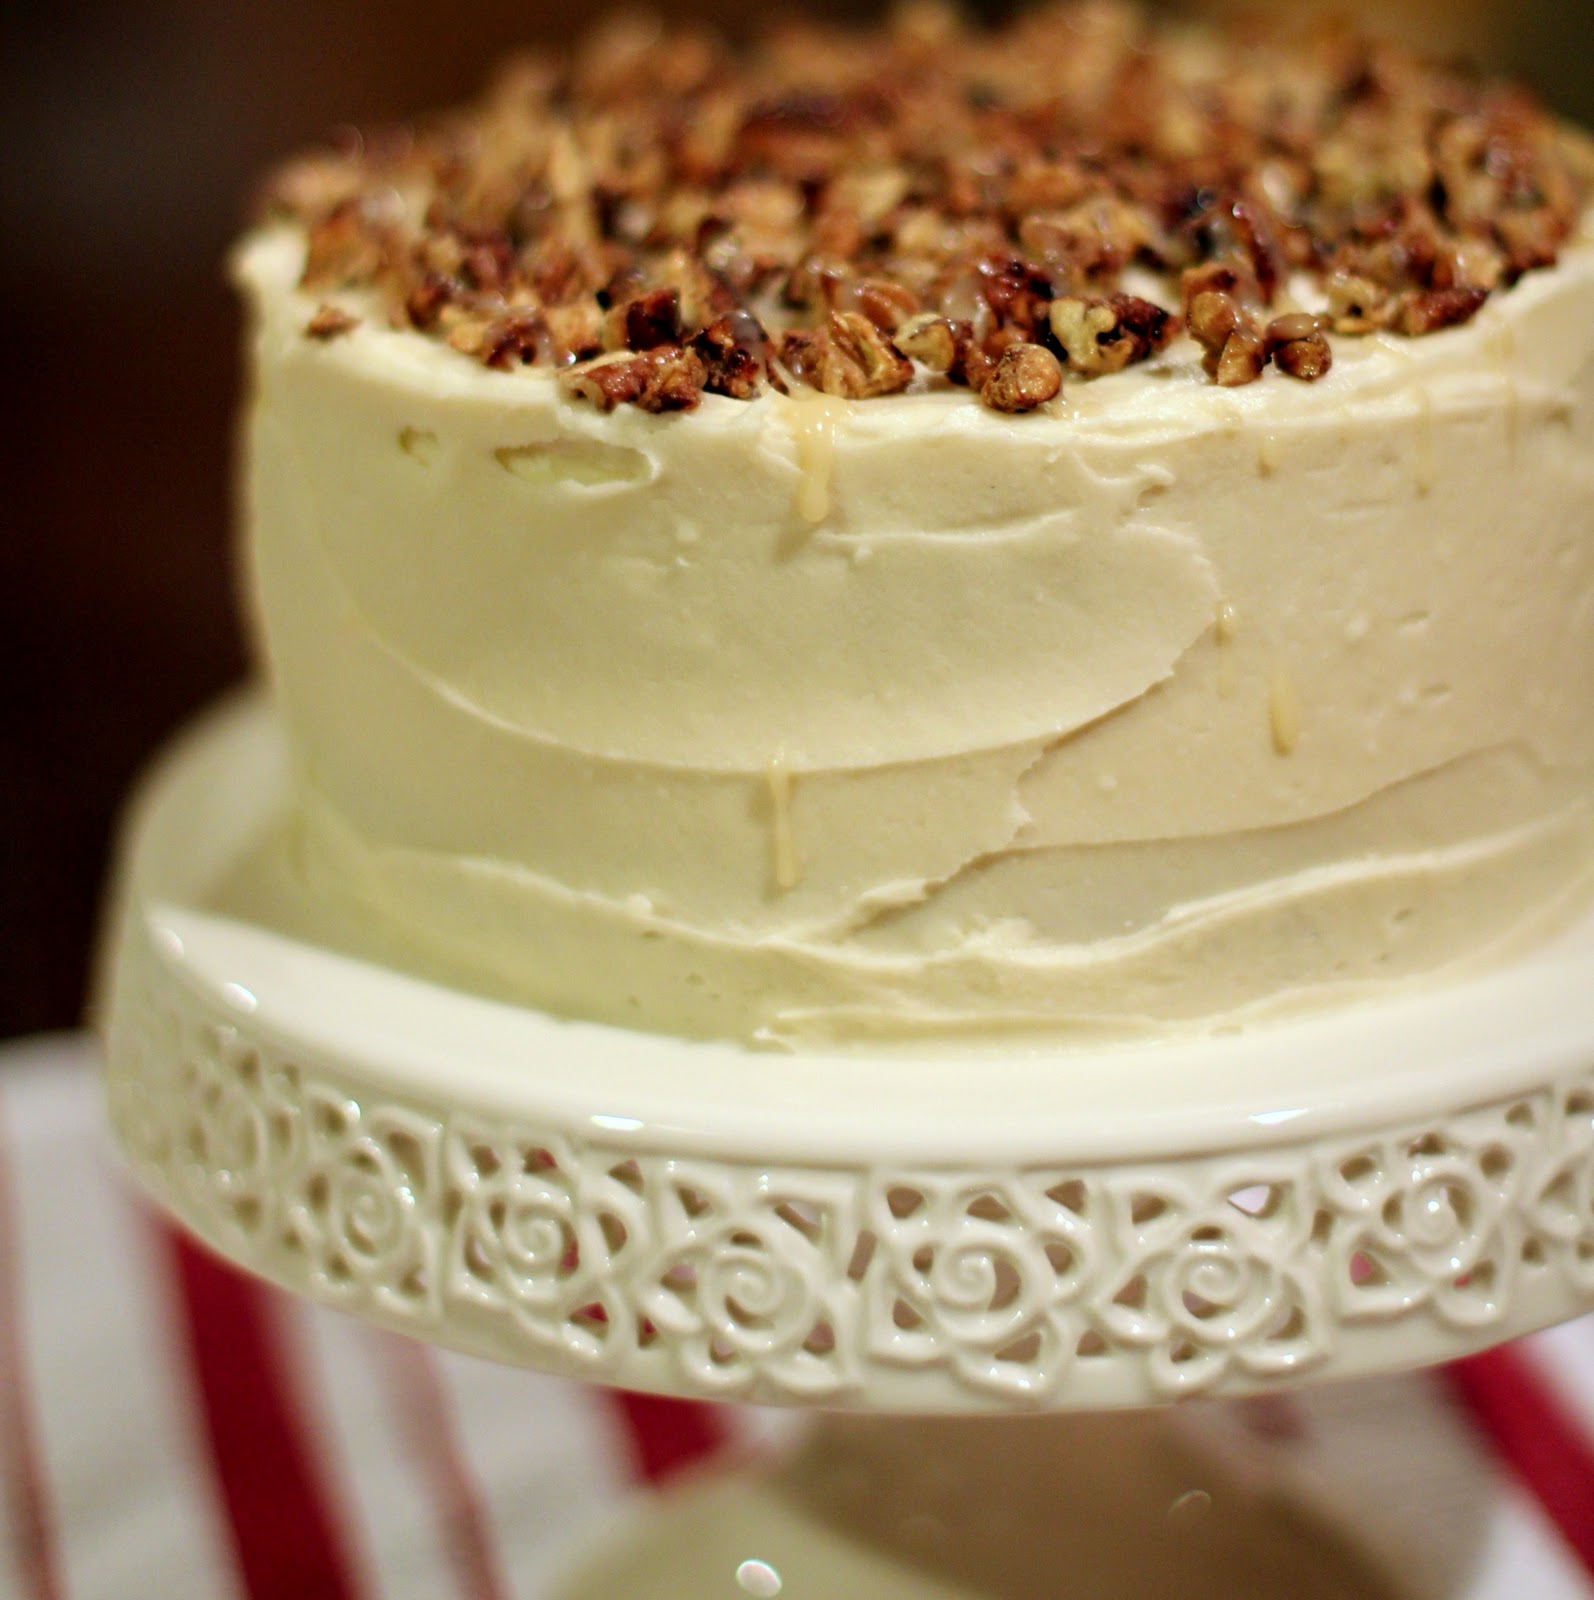 Shared Bites: French Vanilla Cake W/Caramel Frosting